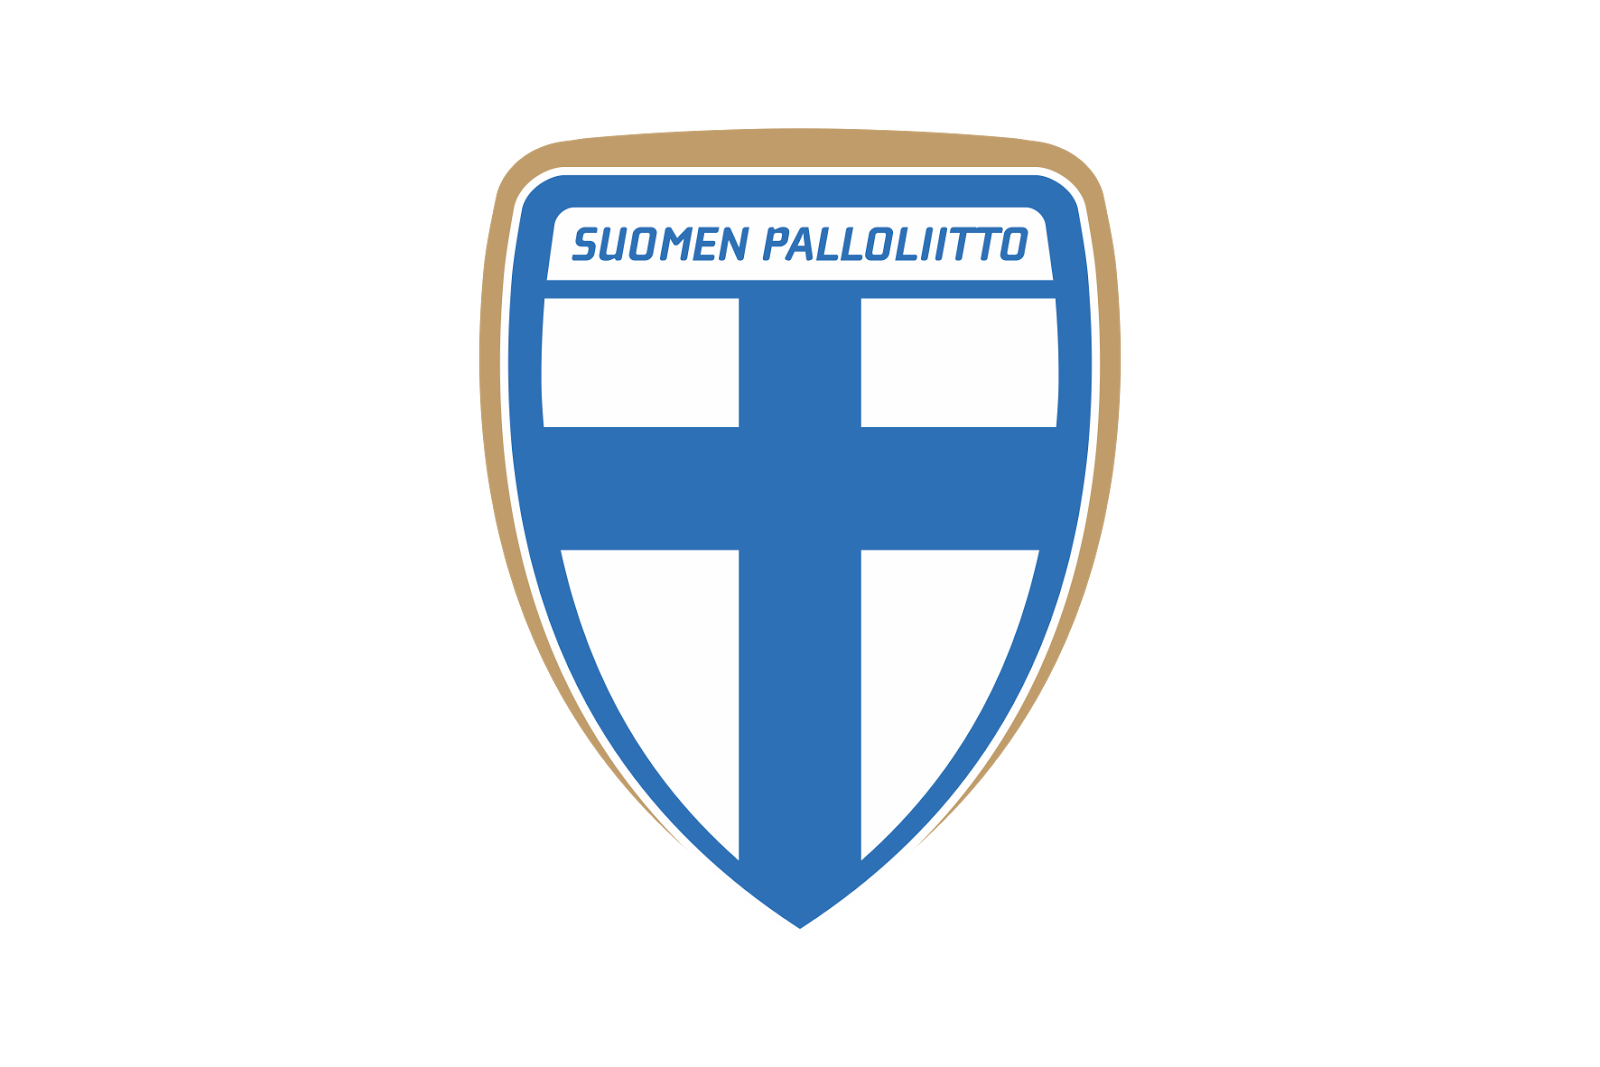 Finland Football Association